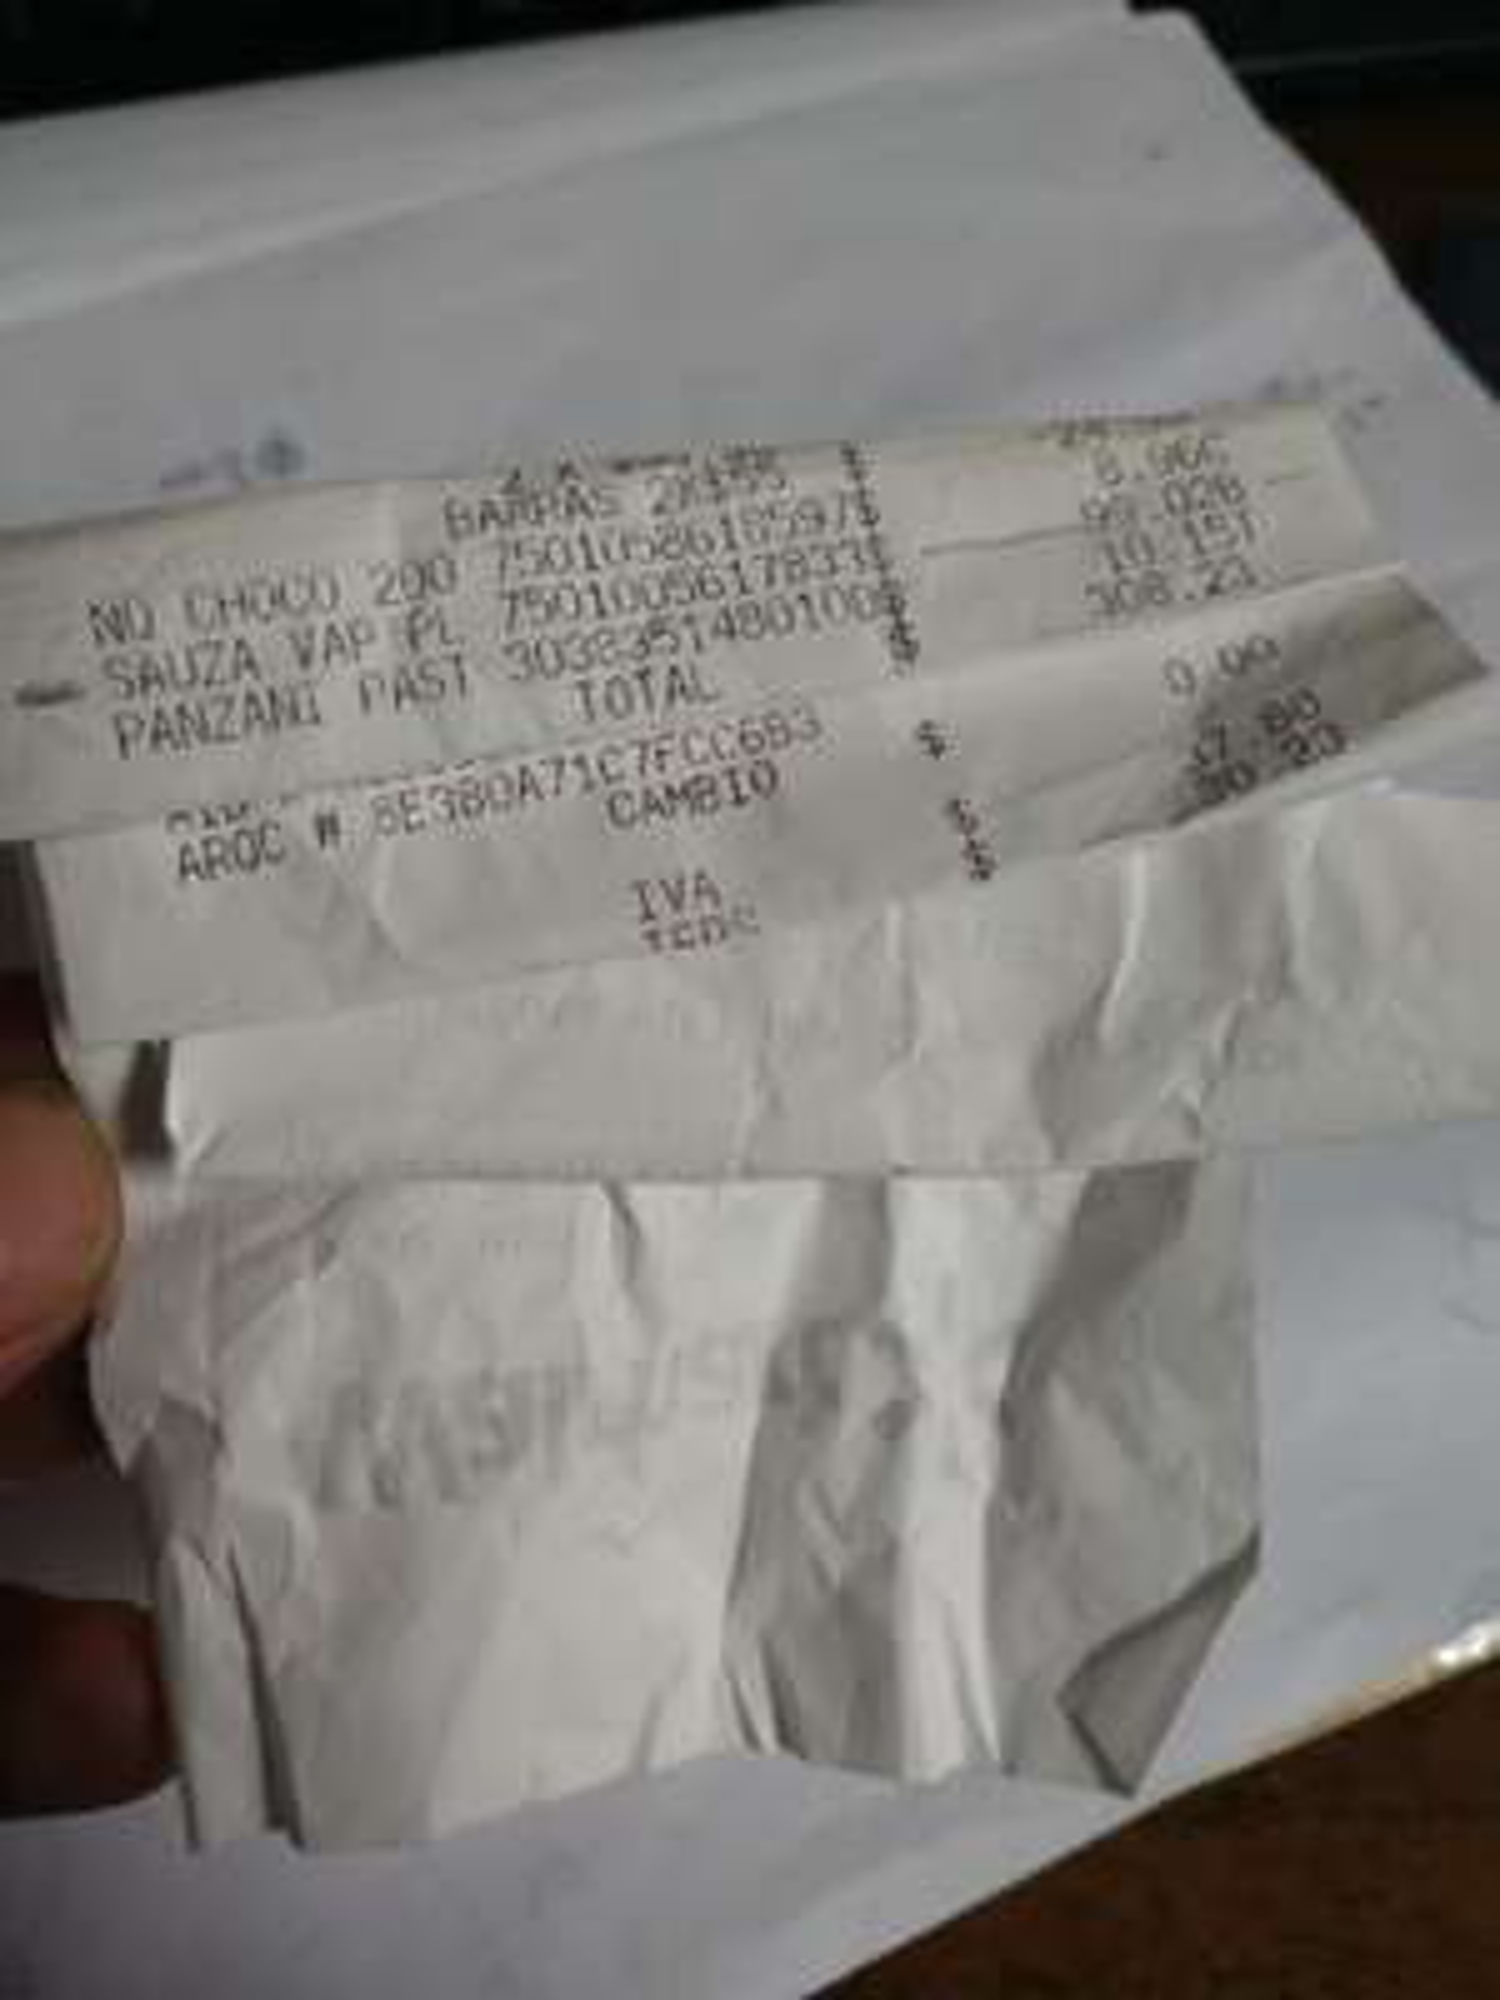 Walmart Toltecas: Tequila Sauza Plata + vaso